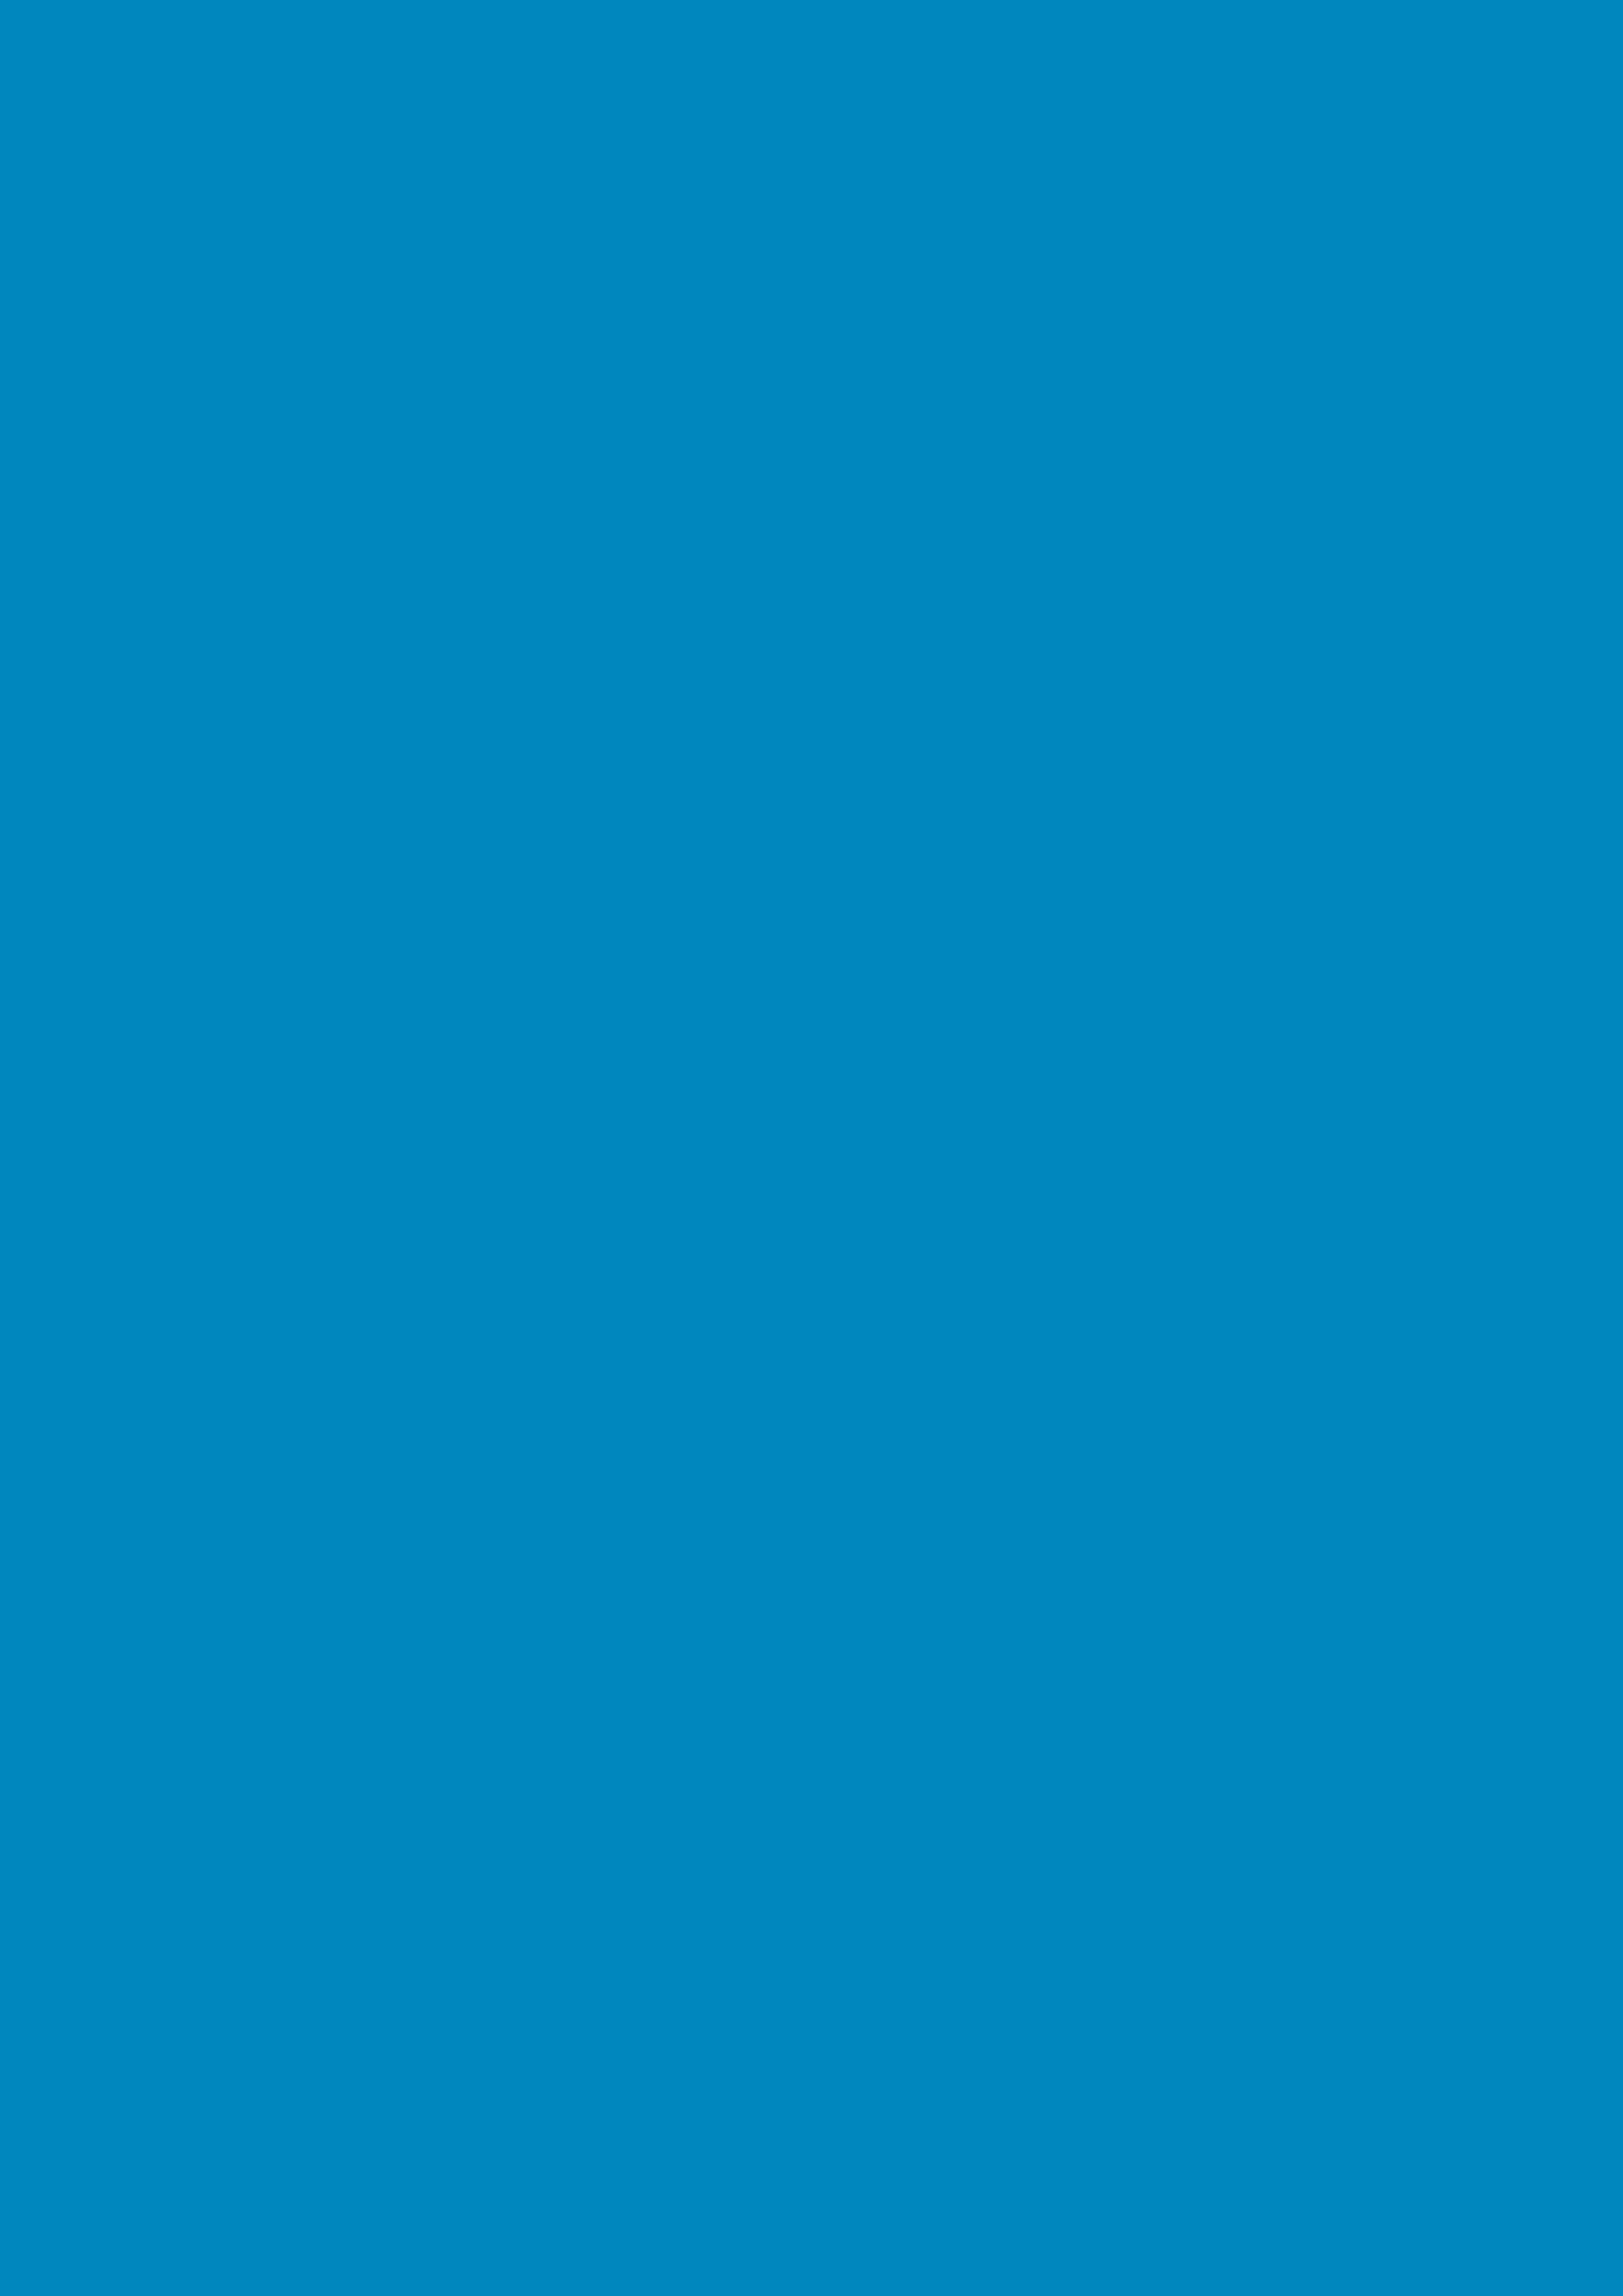 2480x3508 Blue NCS Solid Color Background